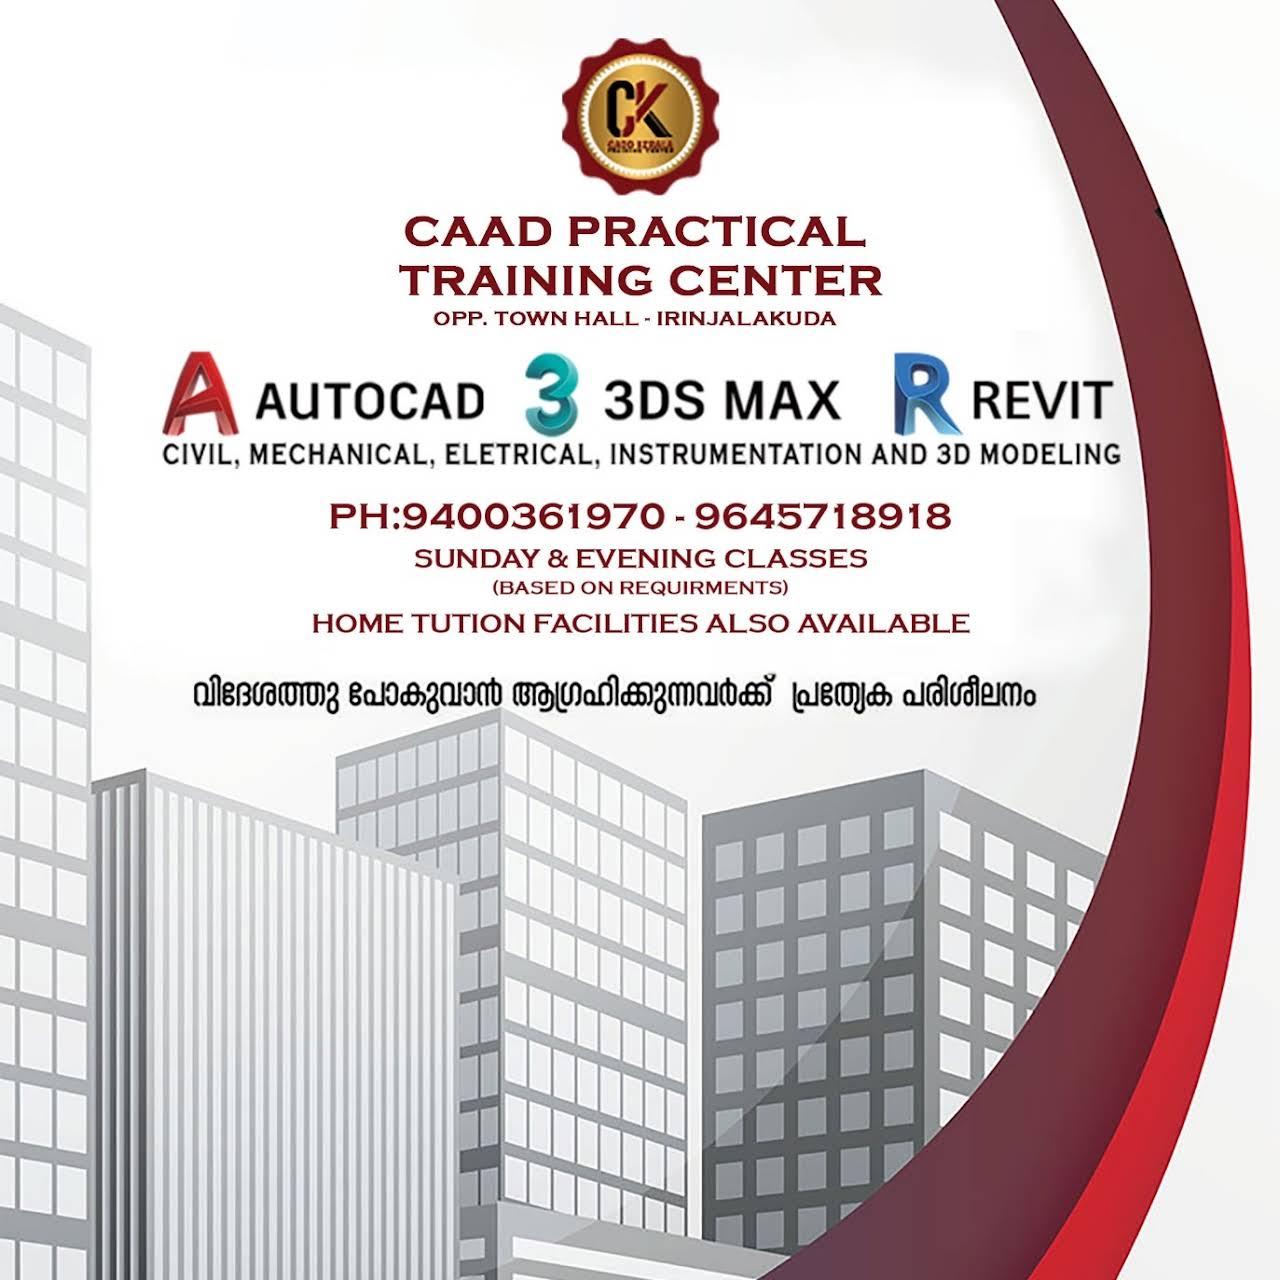 CADD KERALA CADD PRACTICAL TRAINING CENTER AUTOCAD-REVIT